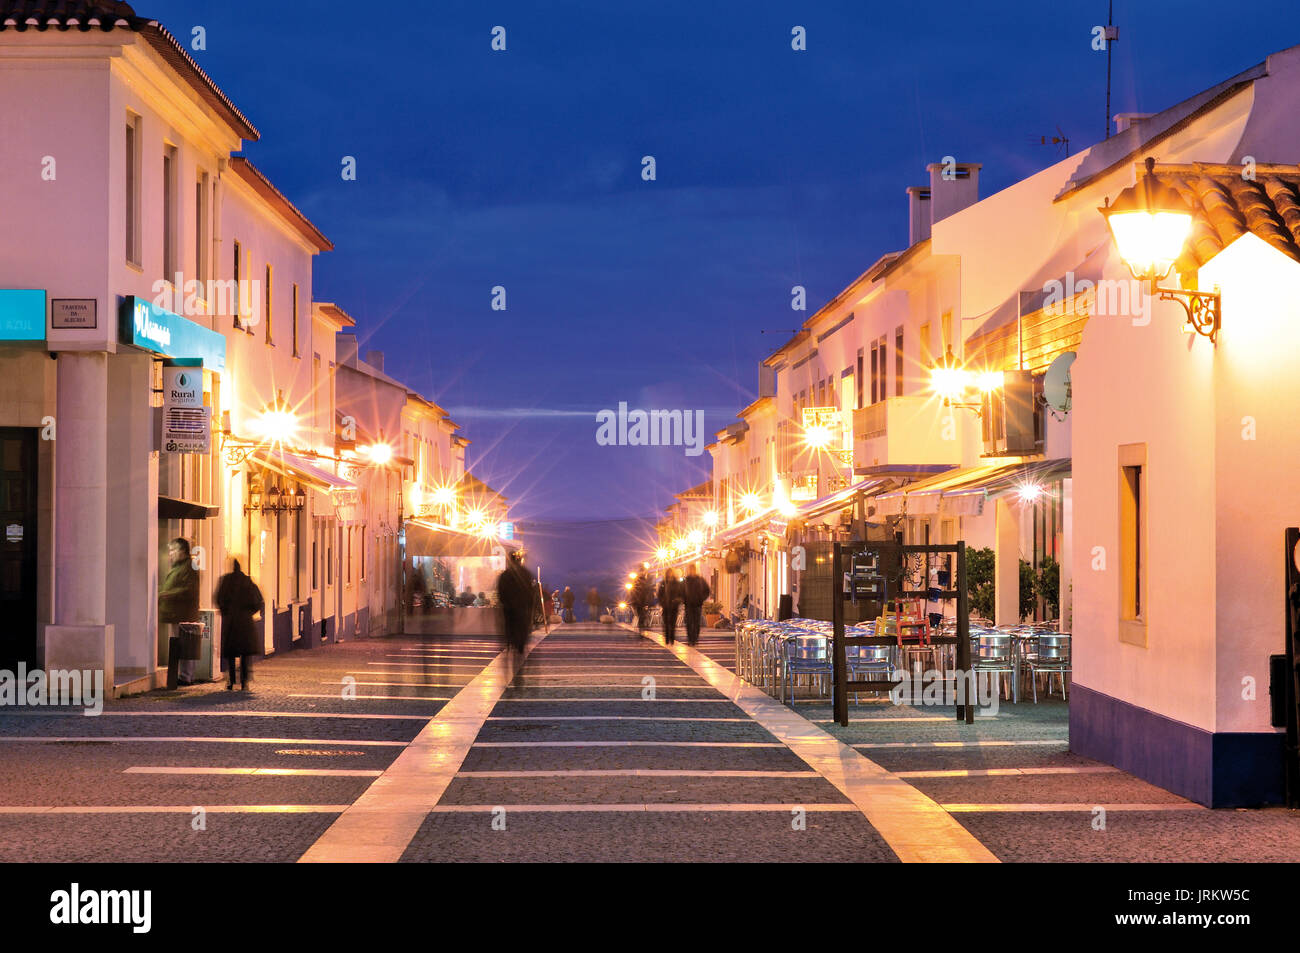 People walking along noctural illuminated main street in charming coastal village Porto Covo - Stock Image